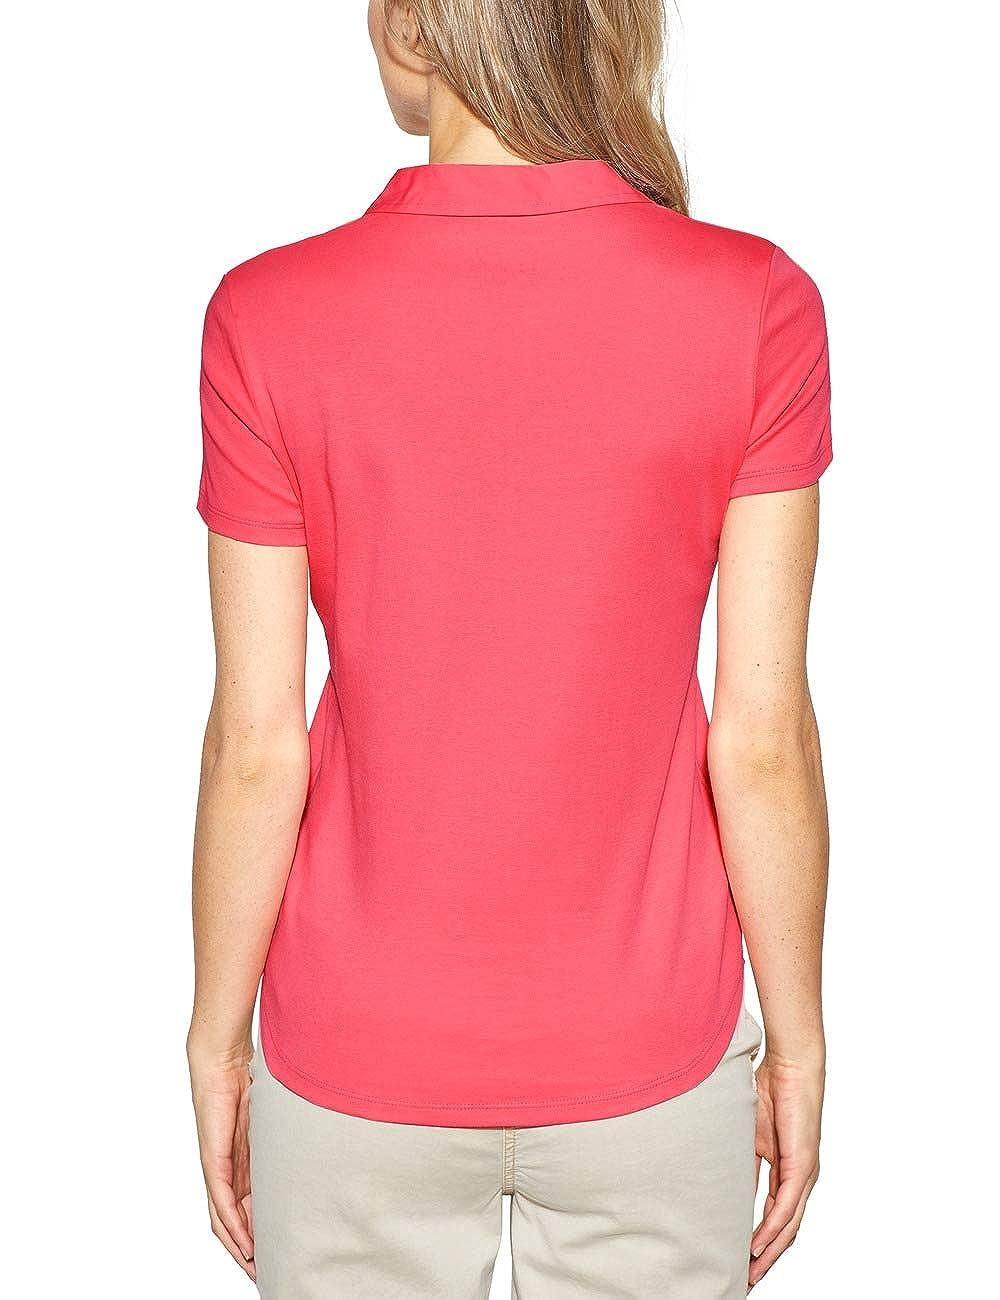 Cecil Damen T-Shirt 313337 Nele